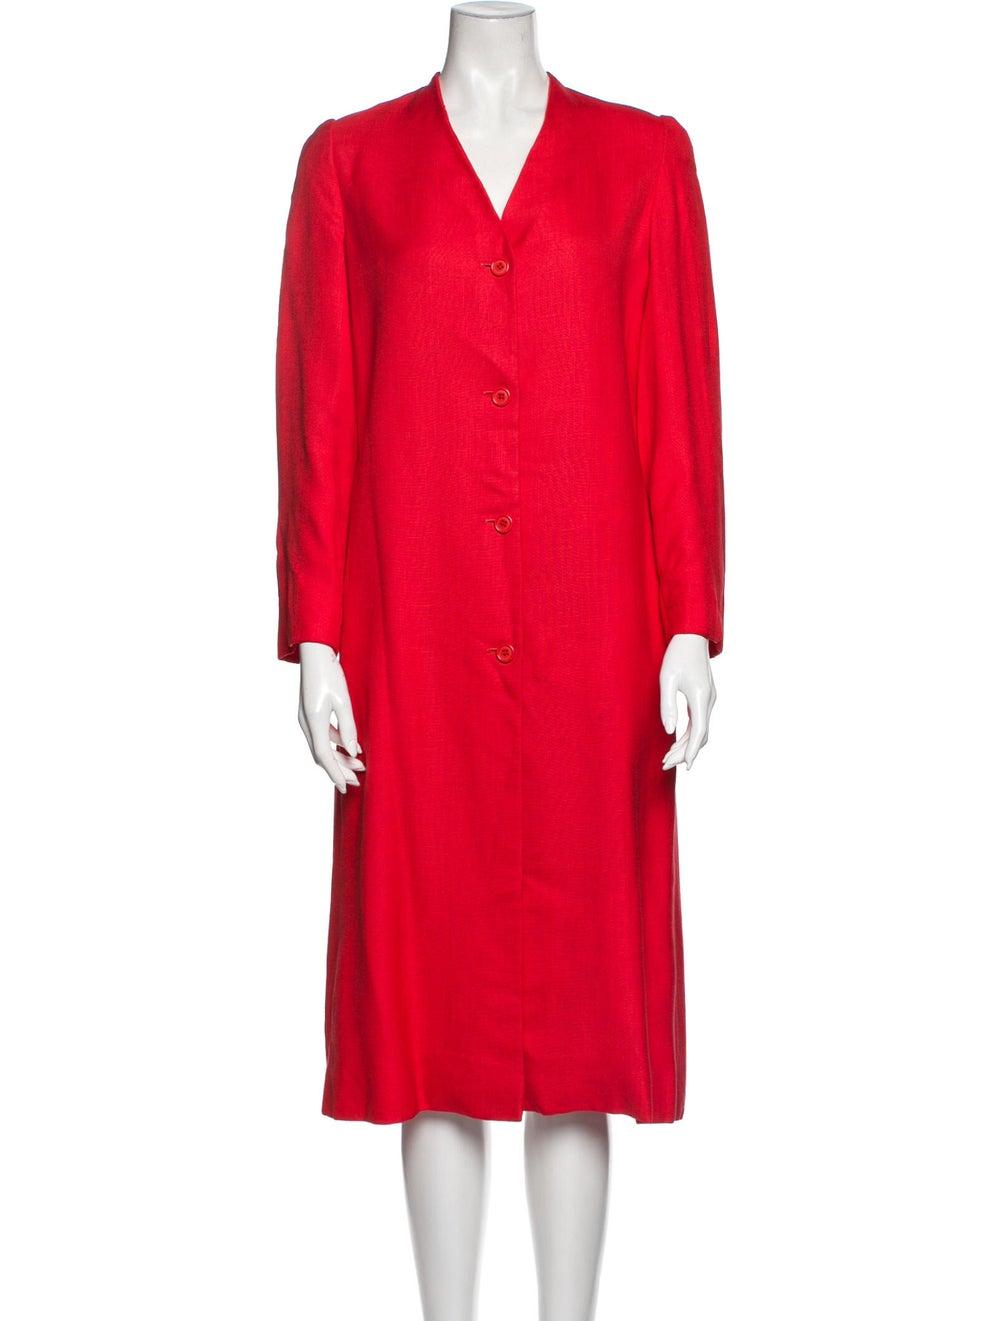 Halston Vintage Midi Length Dress Red - image 1